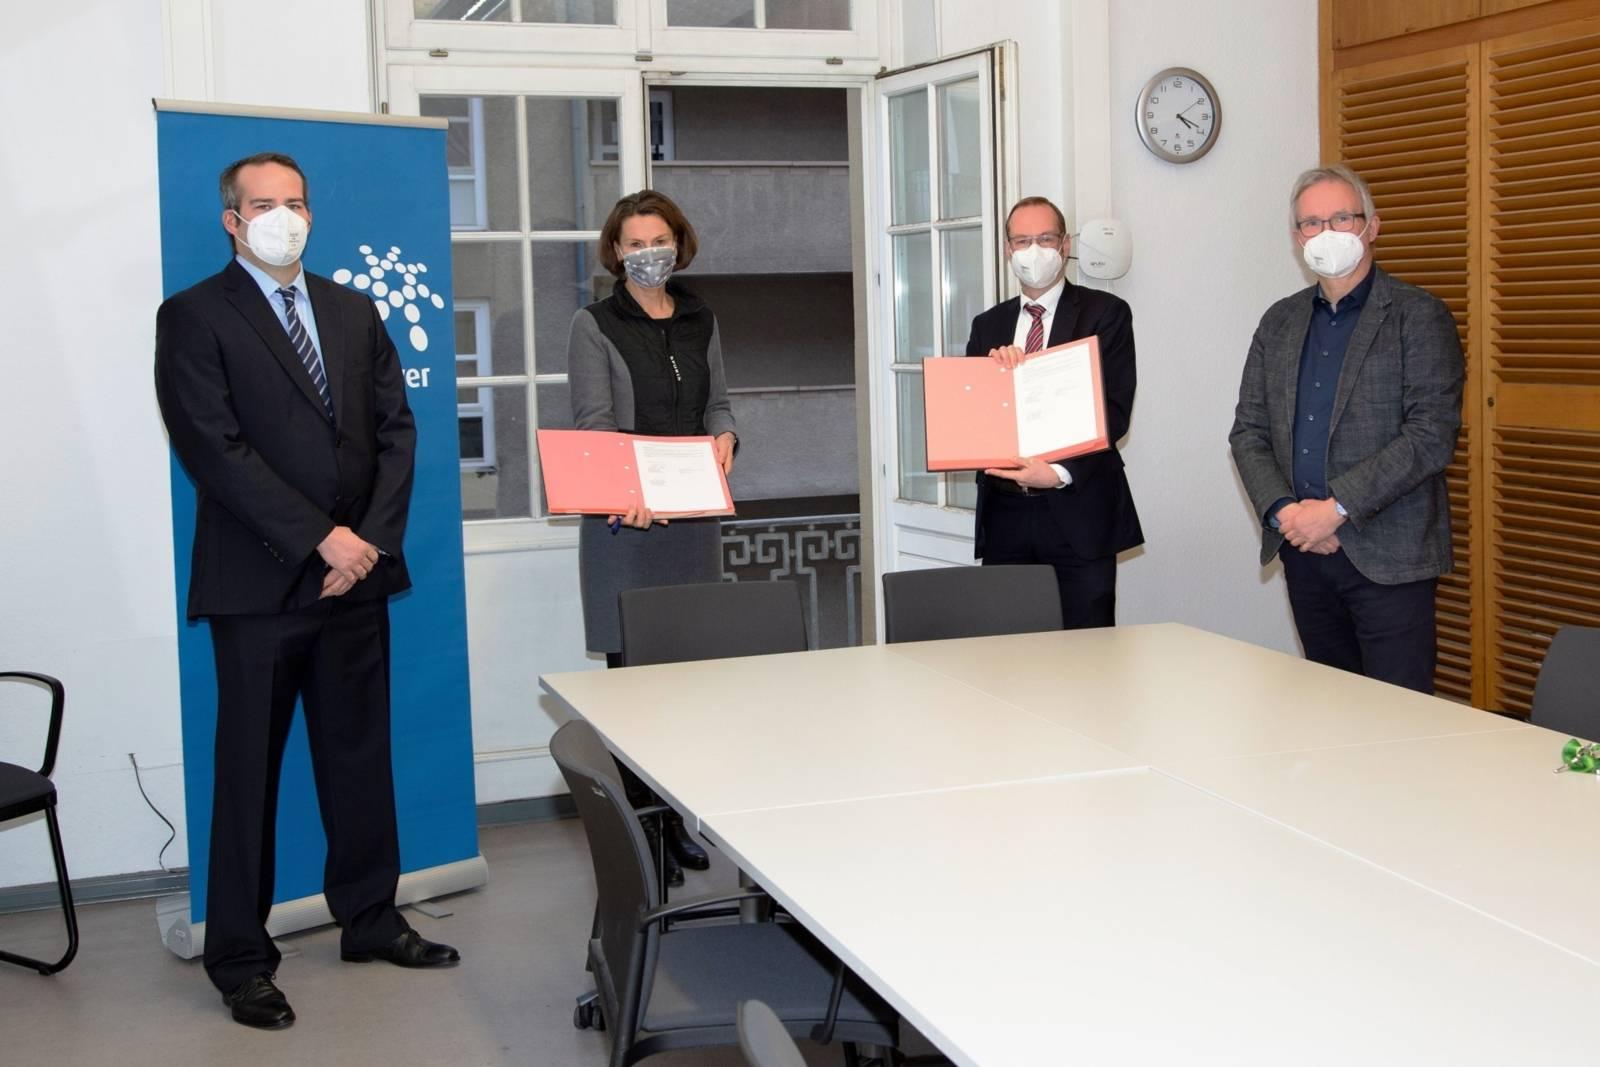 Christopher Toben, Christine Karasch, Sebastian Pinke, Andreas Kutscher